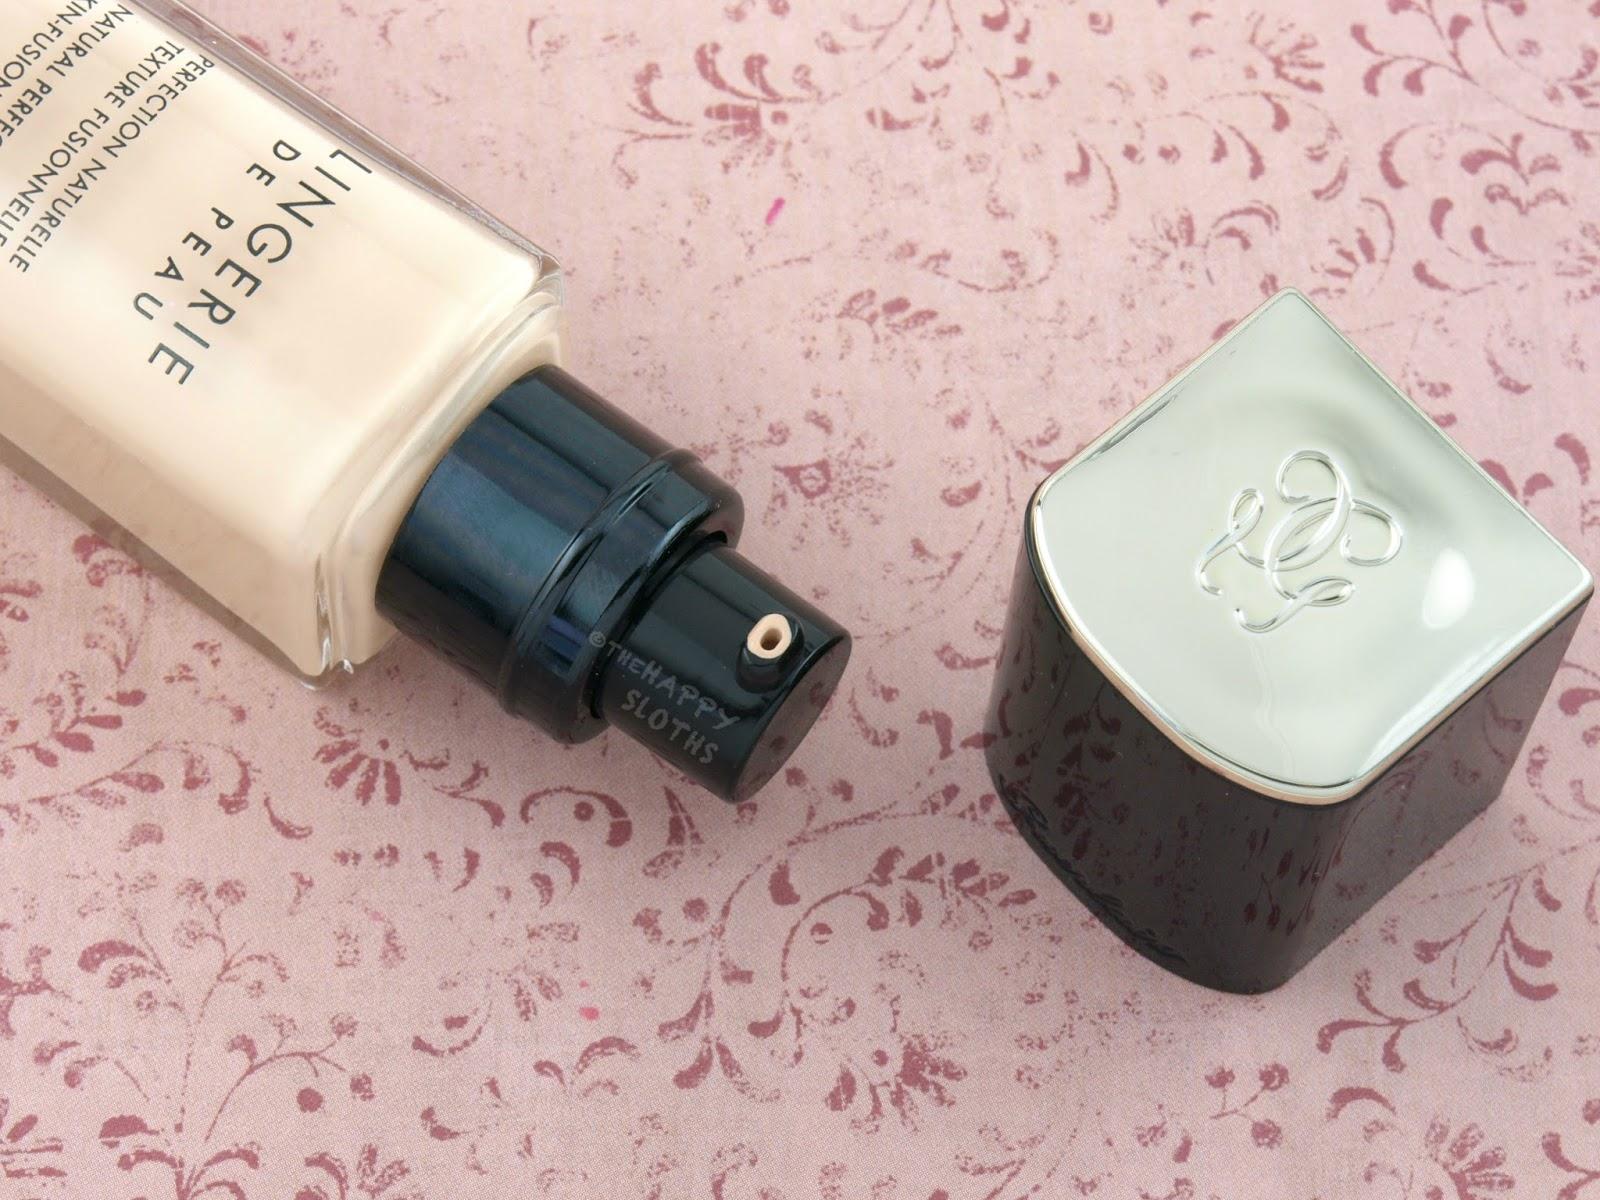 Guerlain Lingerie de Peau Foundation & Multi-Perfecting Concealer: Review and Swatches